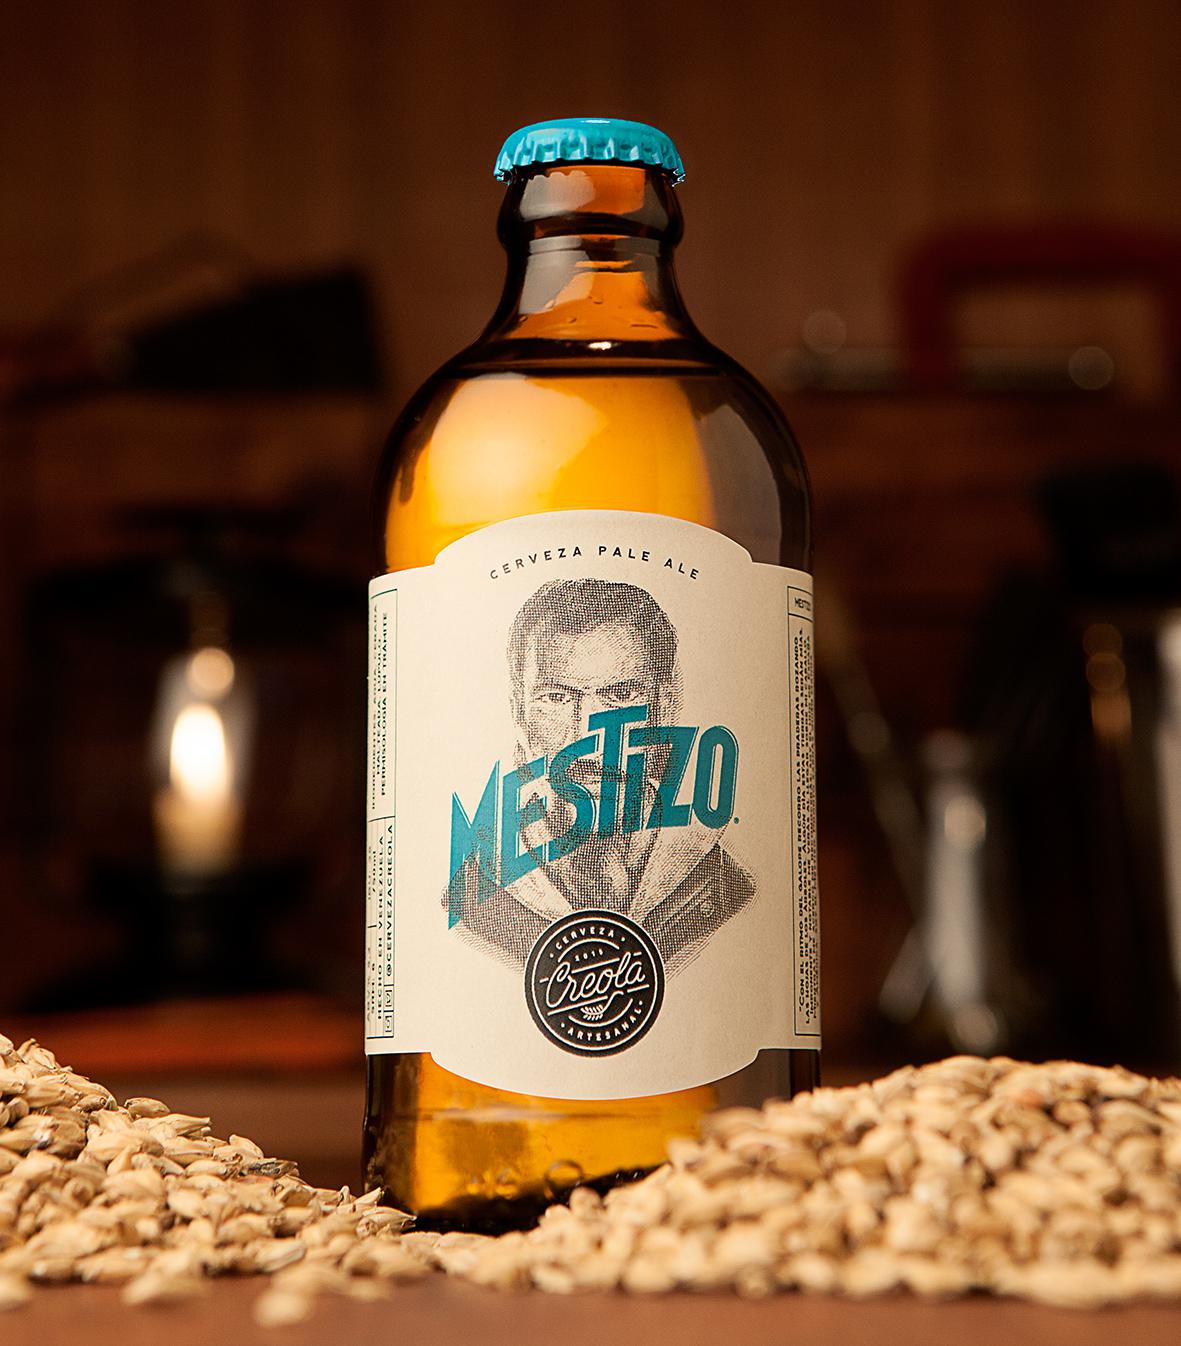 brand beer tag Label drink logo creola craft Logotipo cerveza Licor bebida botella bottle wood